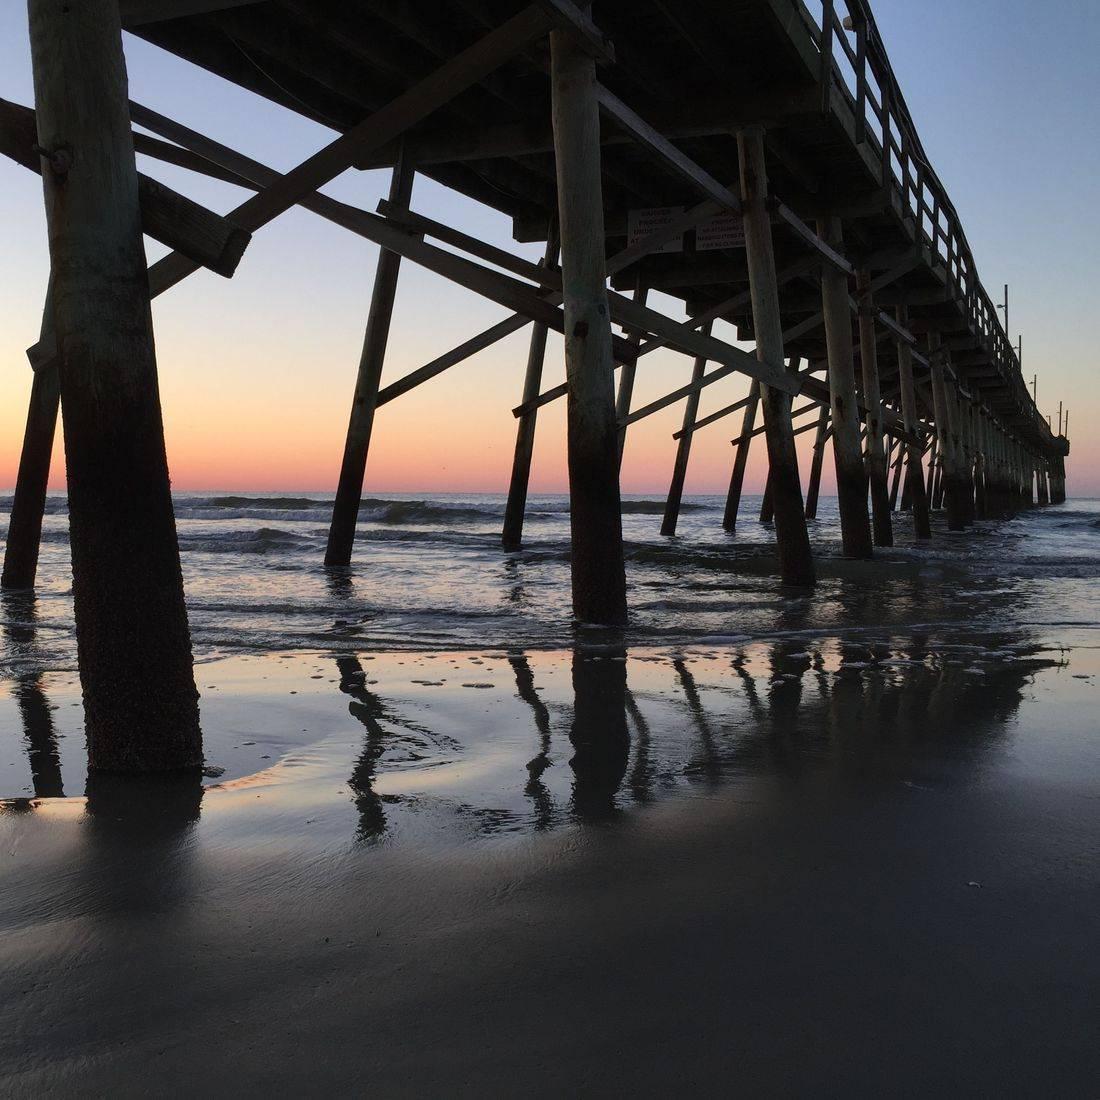 Sunrise, Beach, Pier, Ocean, Waves, Sky, Sunset Beach, North Carolina